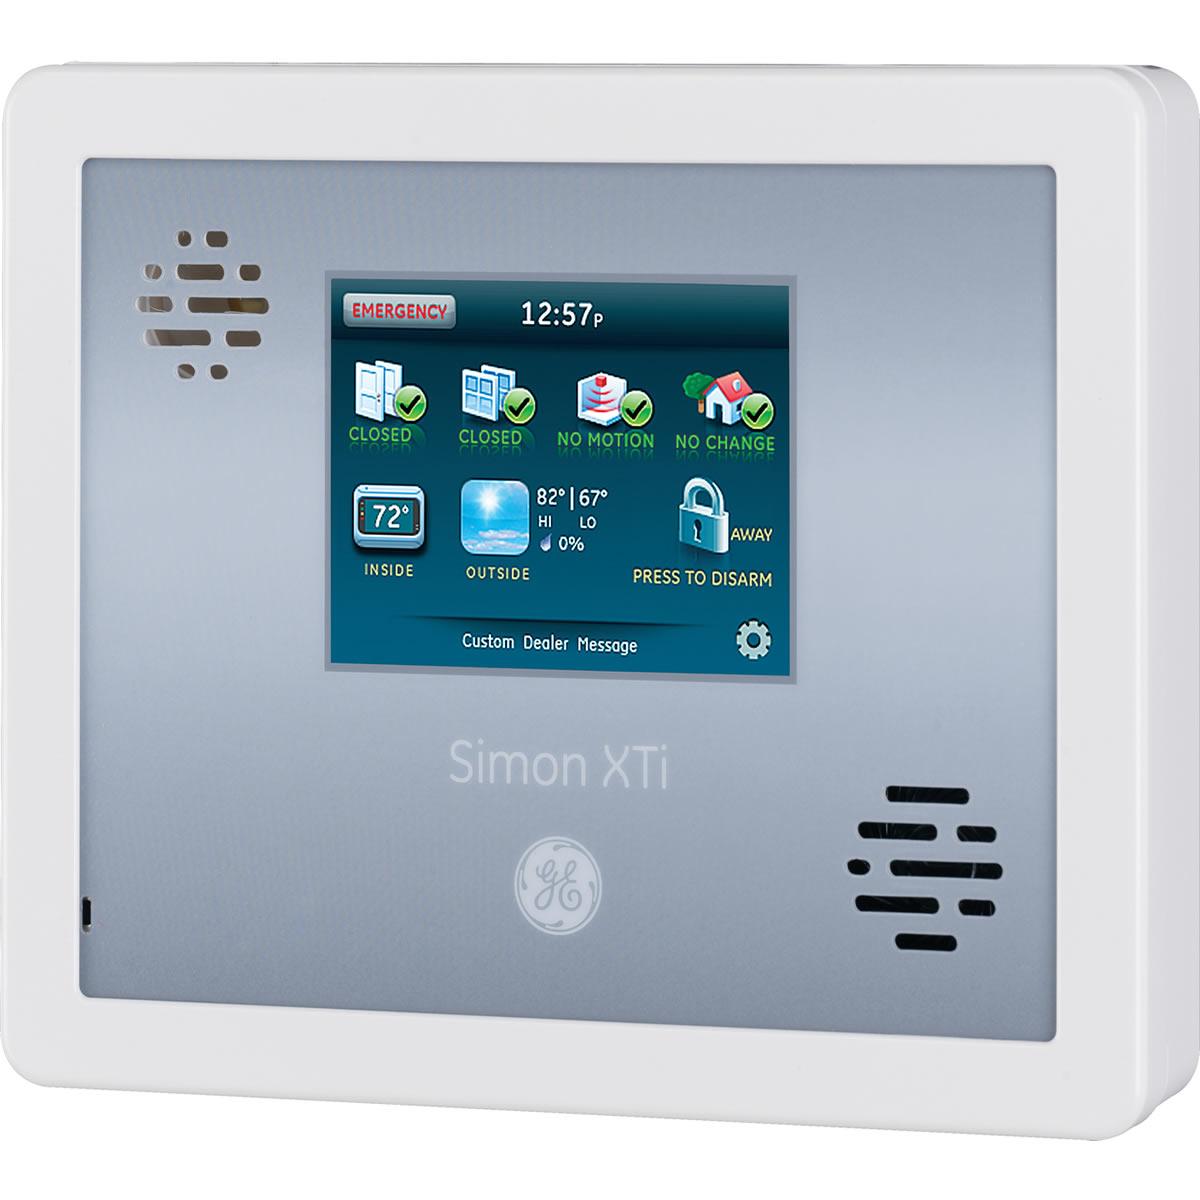 Interlogix Simon Xti 5 Wireless Security System 311 Kit